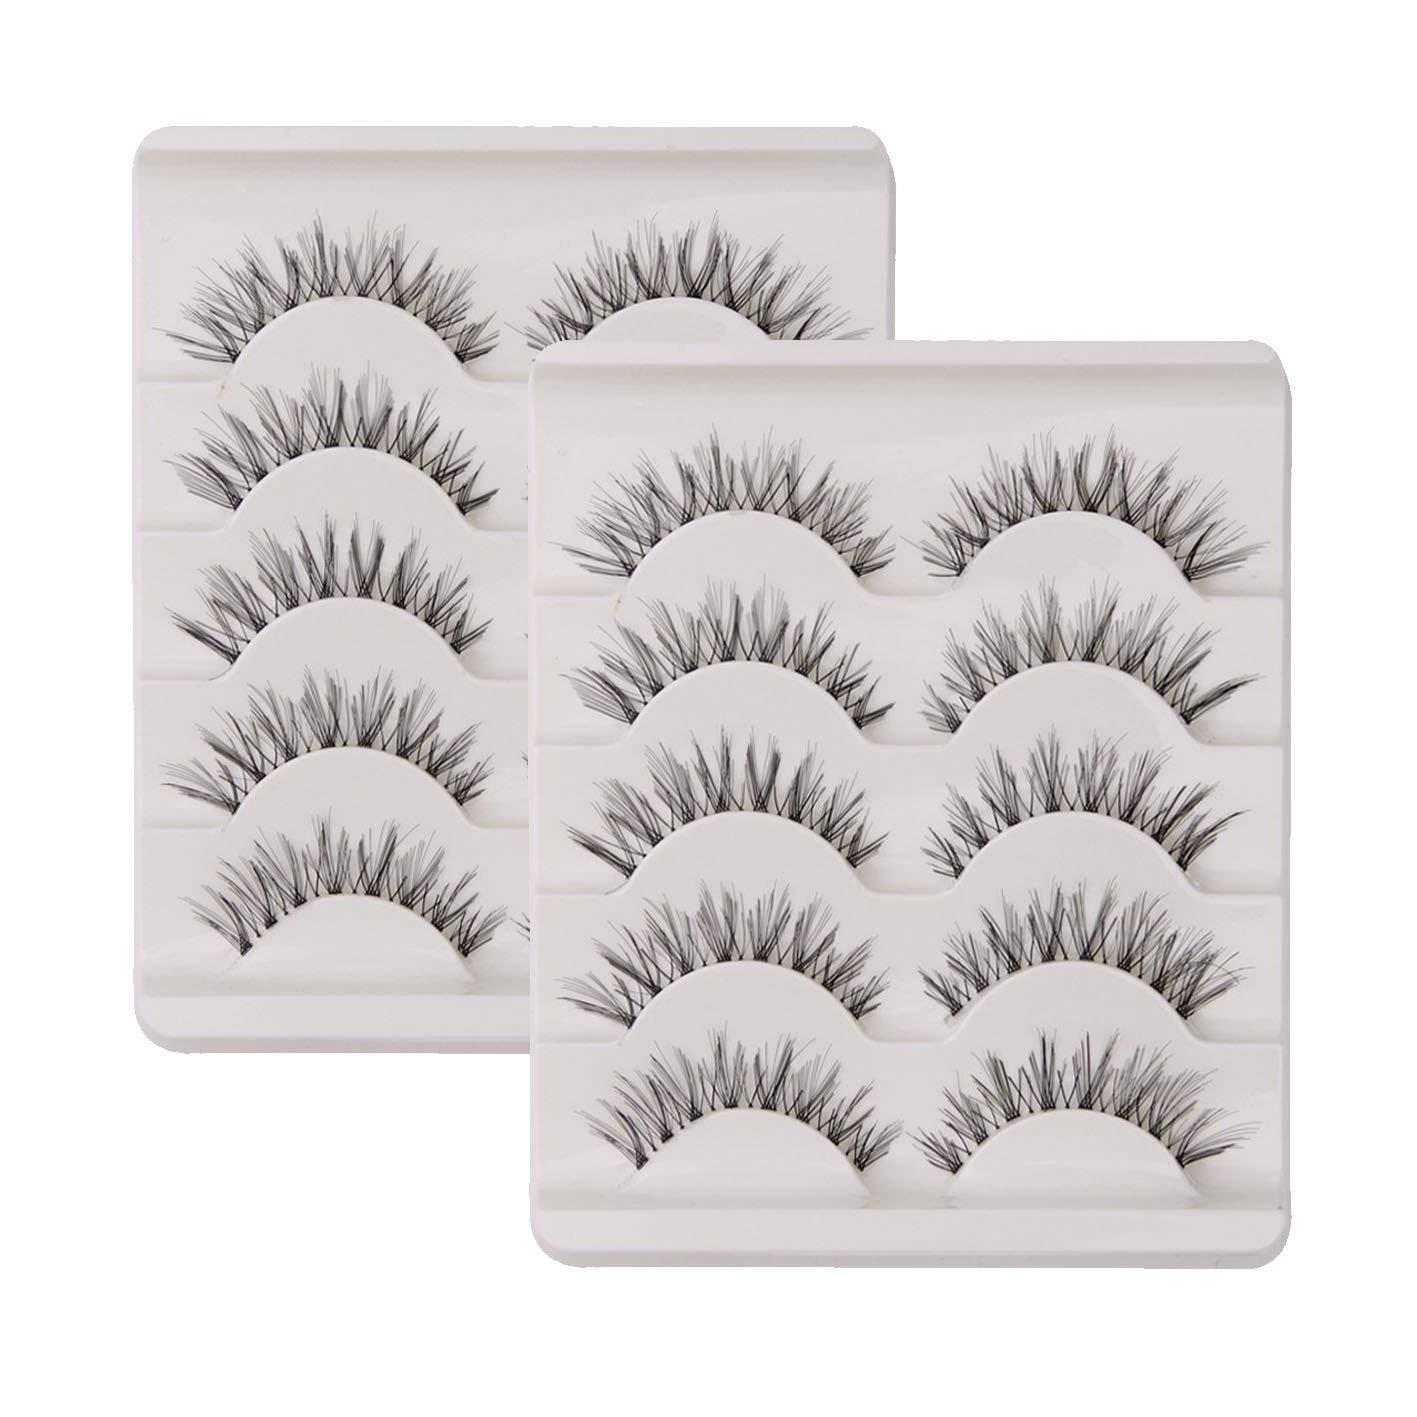 0e1c8e370cc KFZR 10 Pairs False Lashes Eyelashes Natural Look Handmade Crisscross 3D  Reusable Black product image